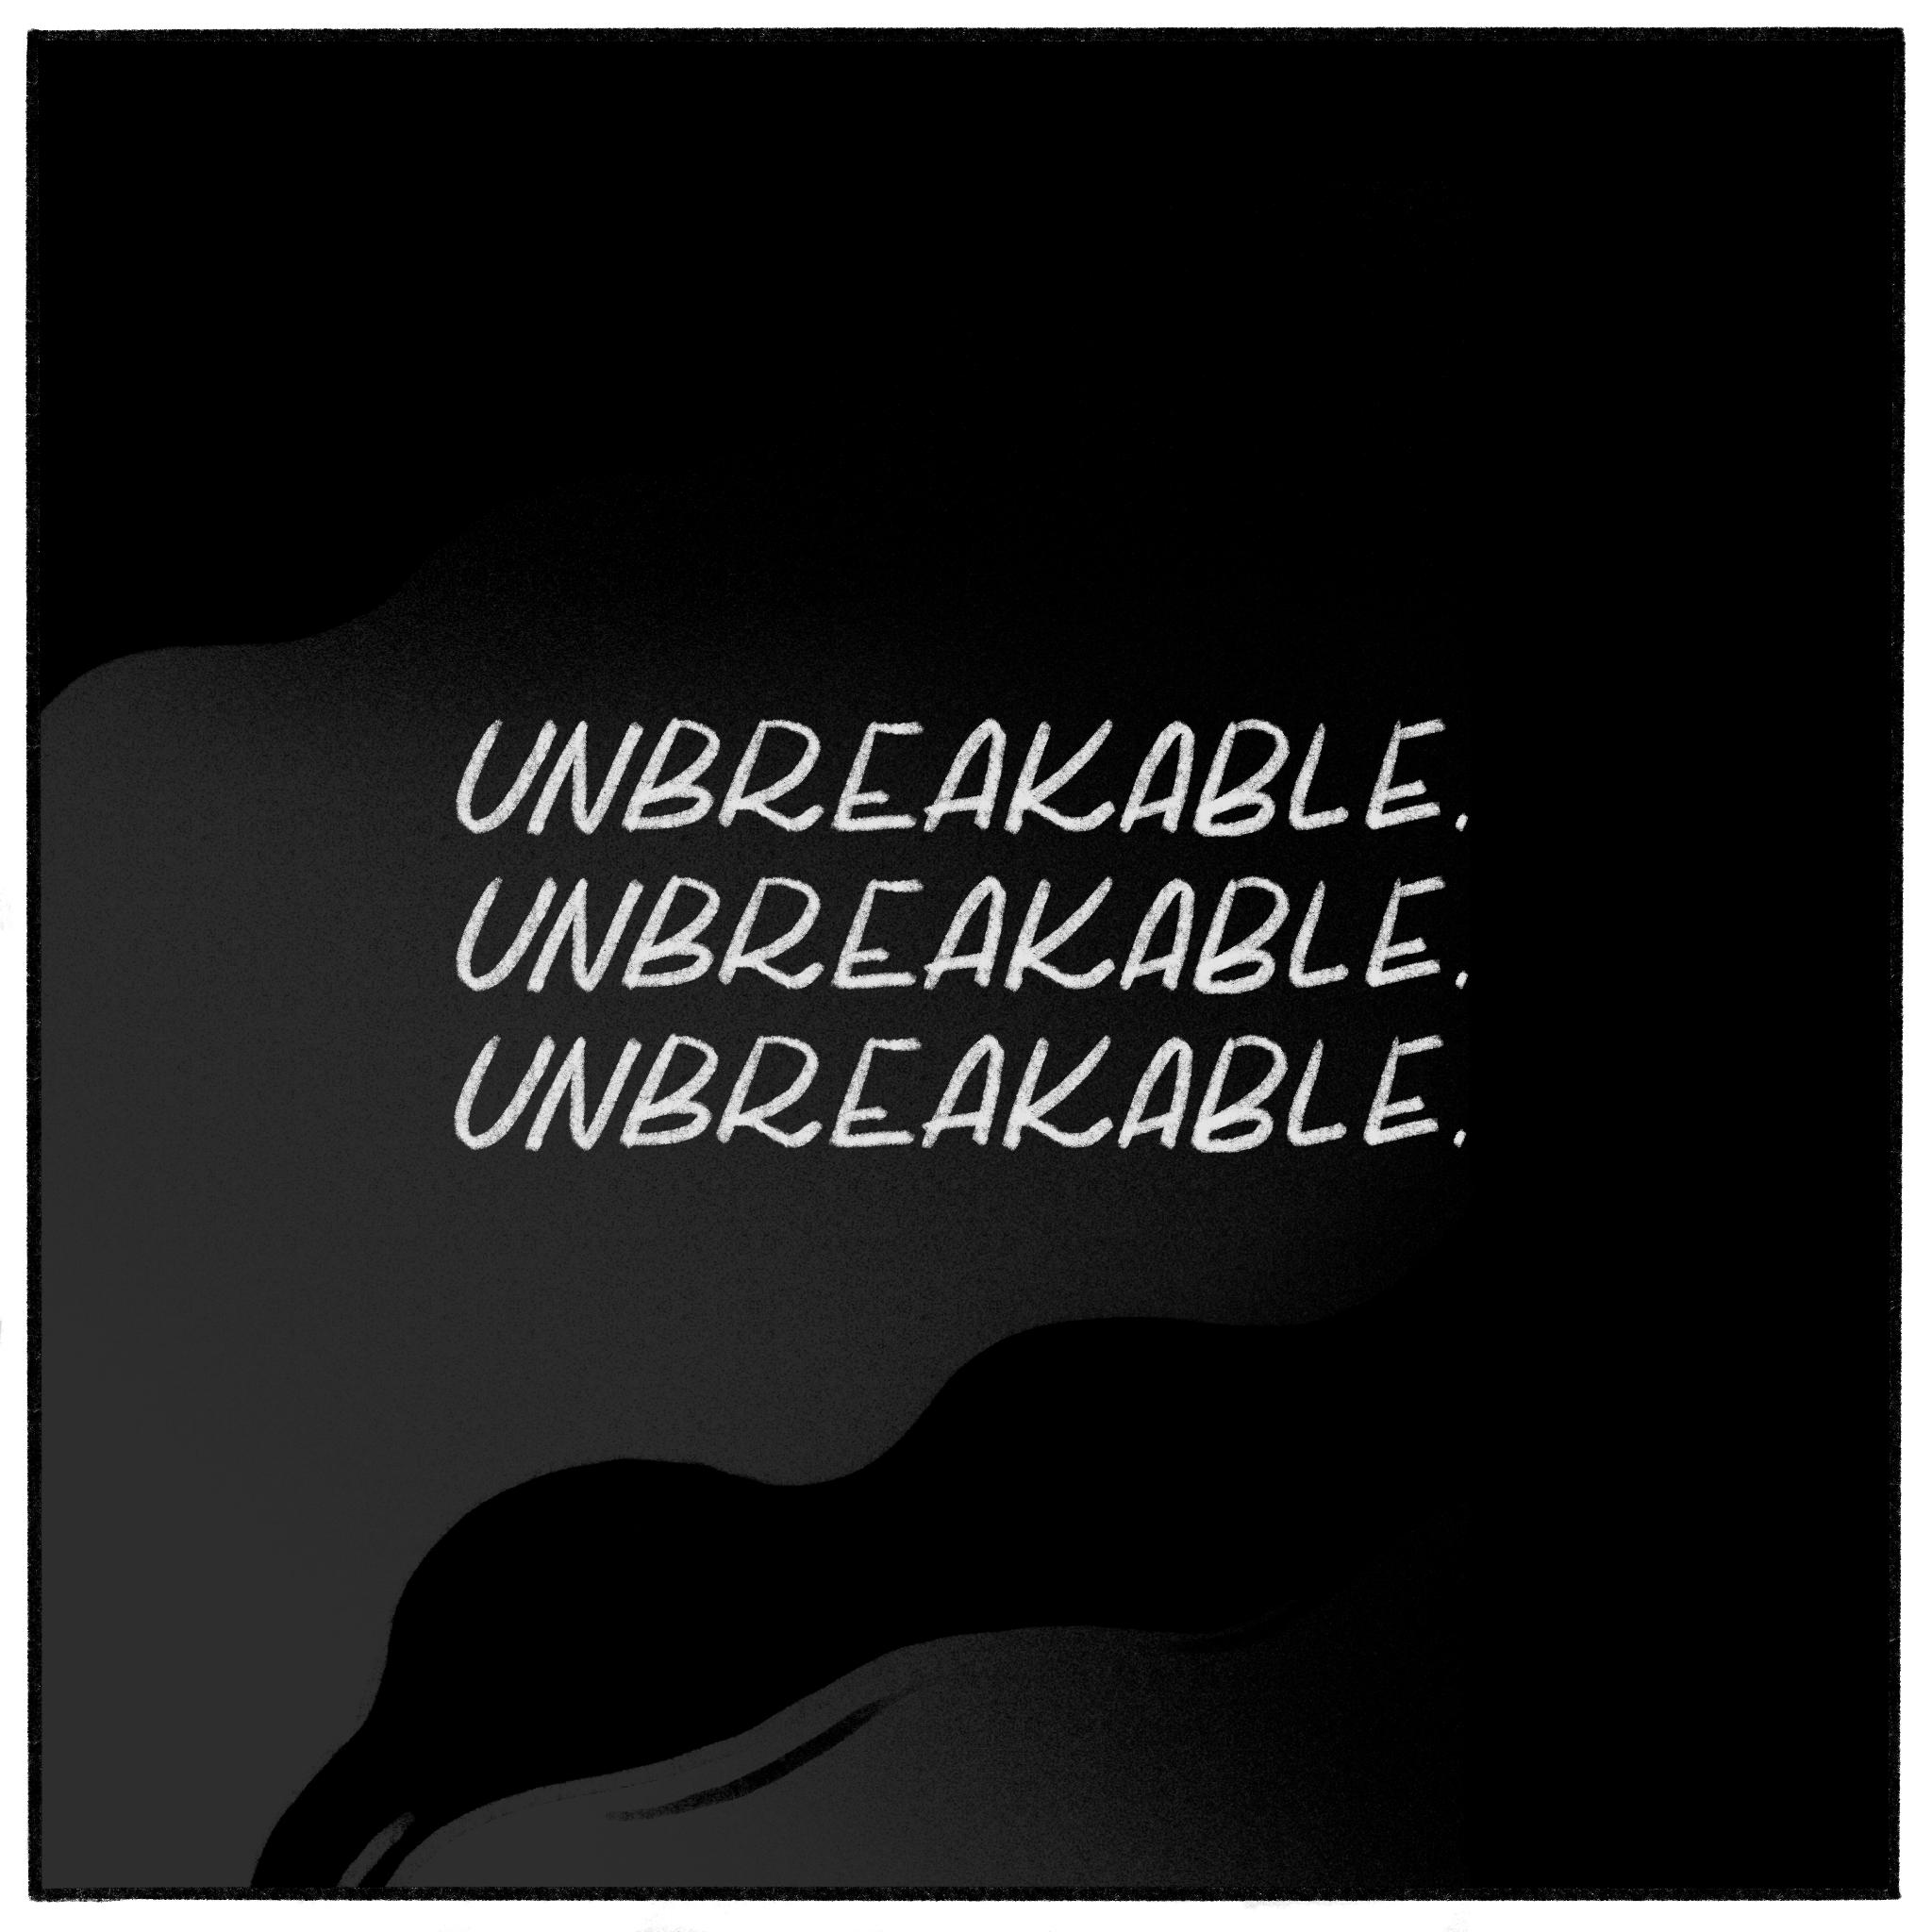 WomxnUnbreakable_7.png